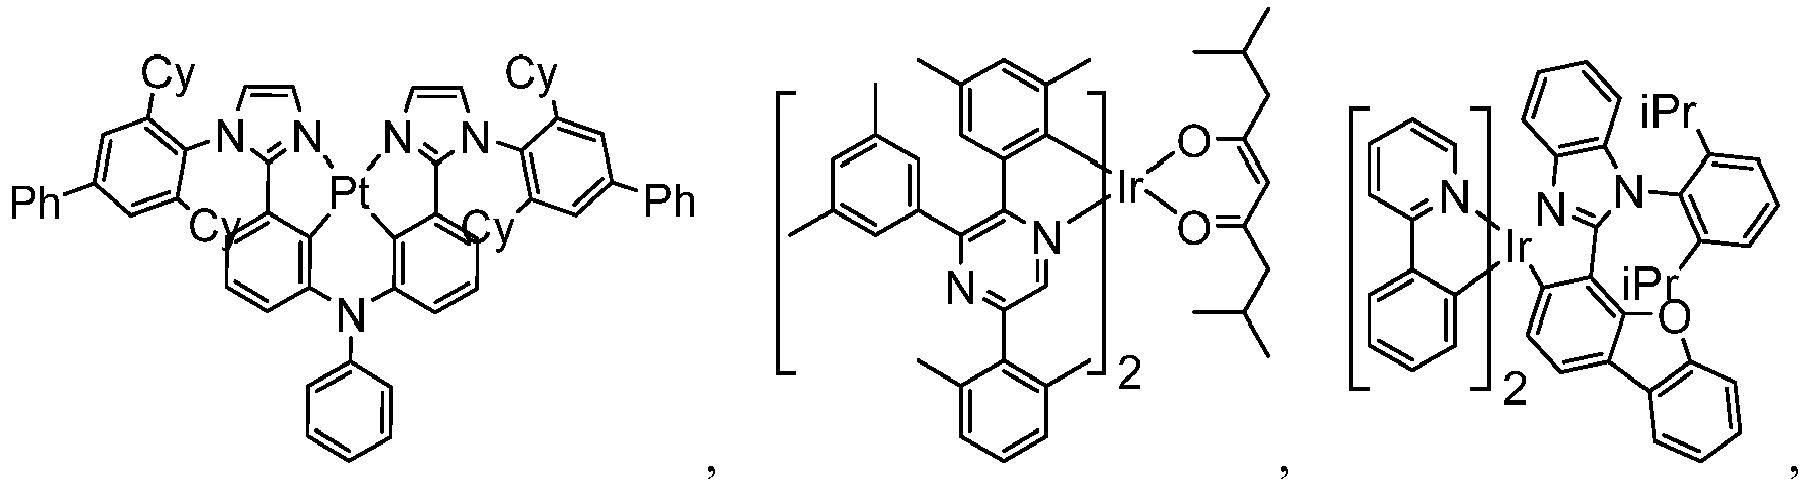 Figure imgb0918